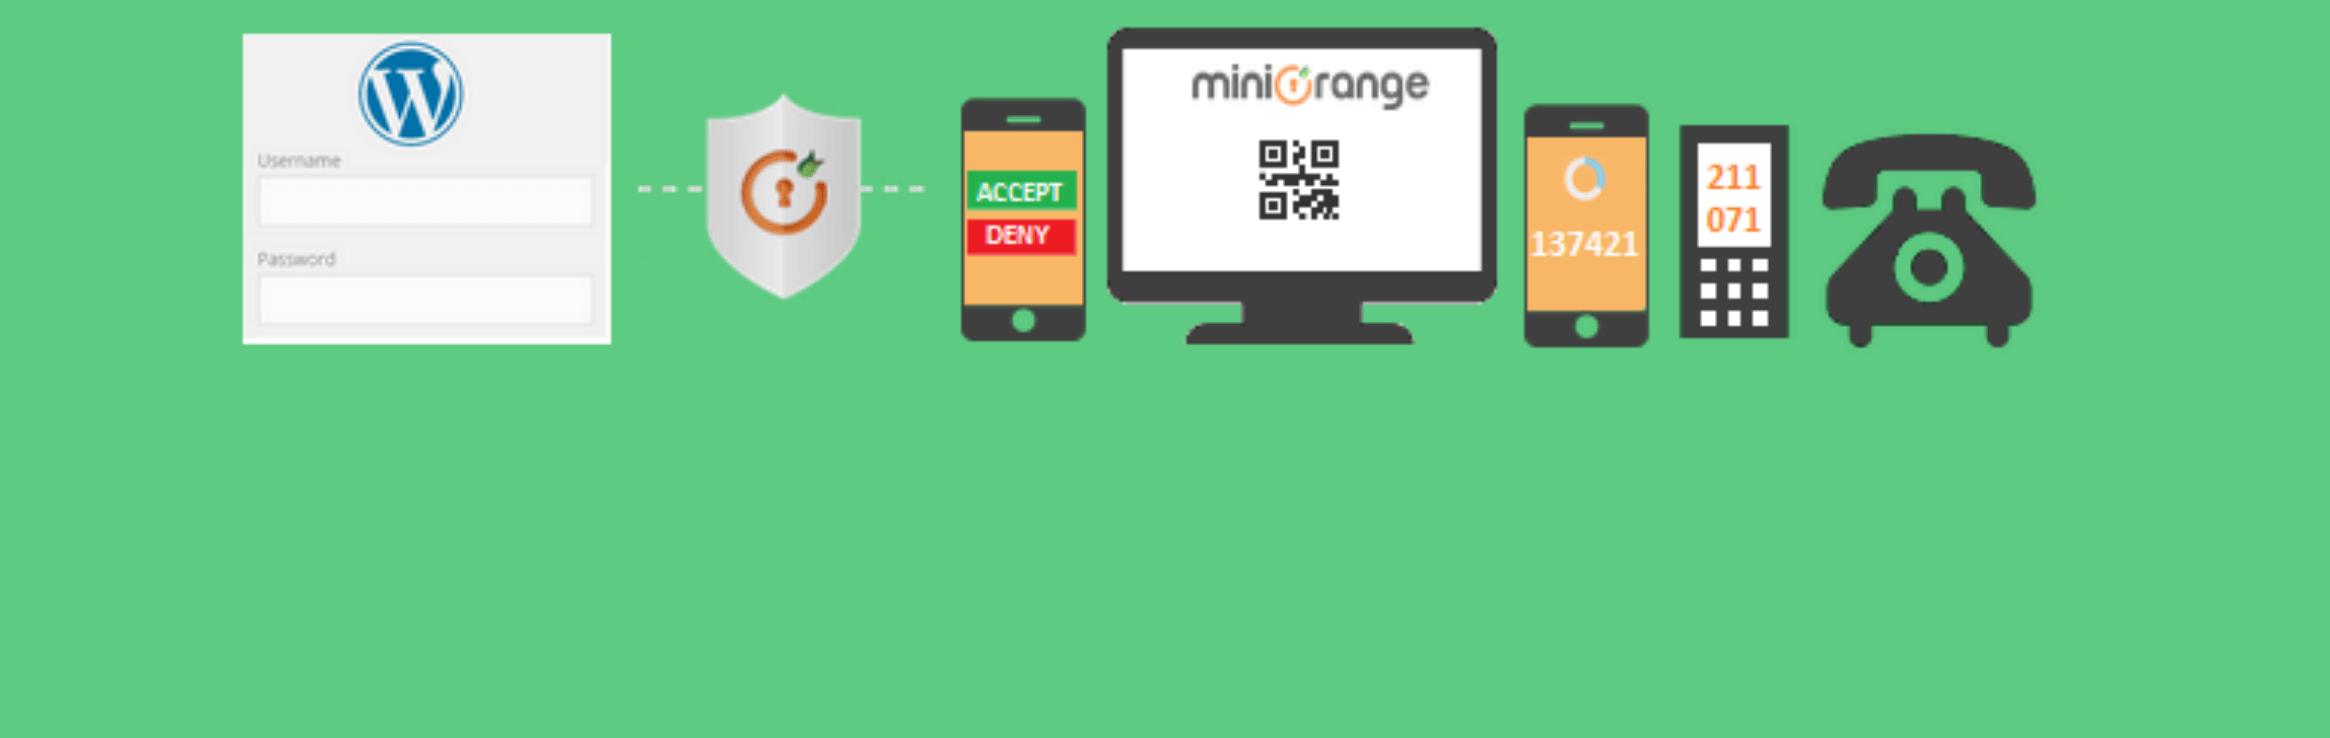 The miniOrange Two Factor Authentication plugin.